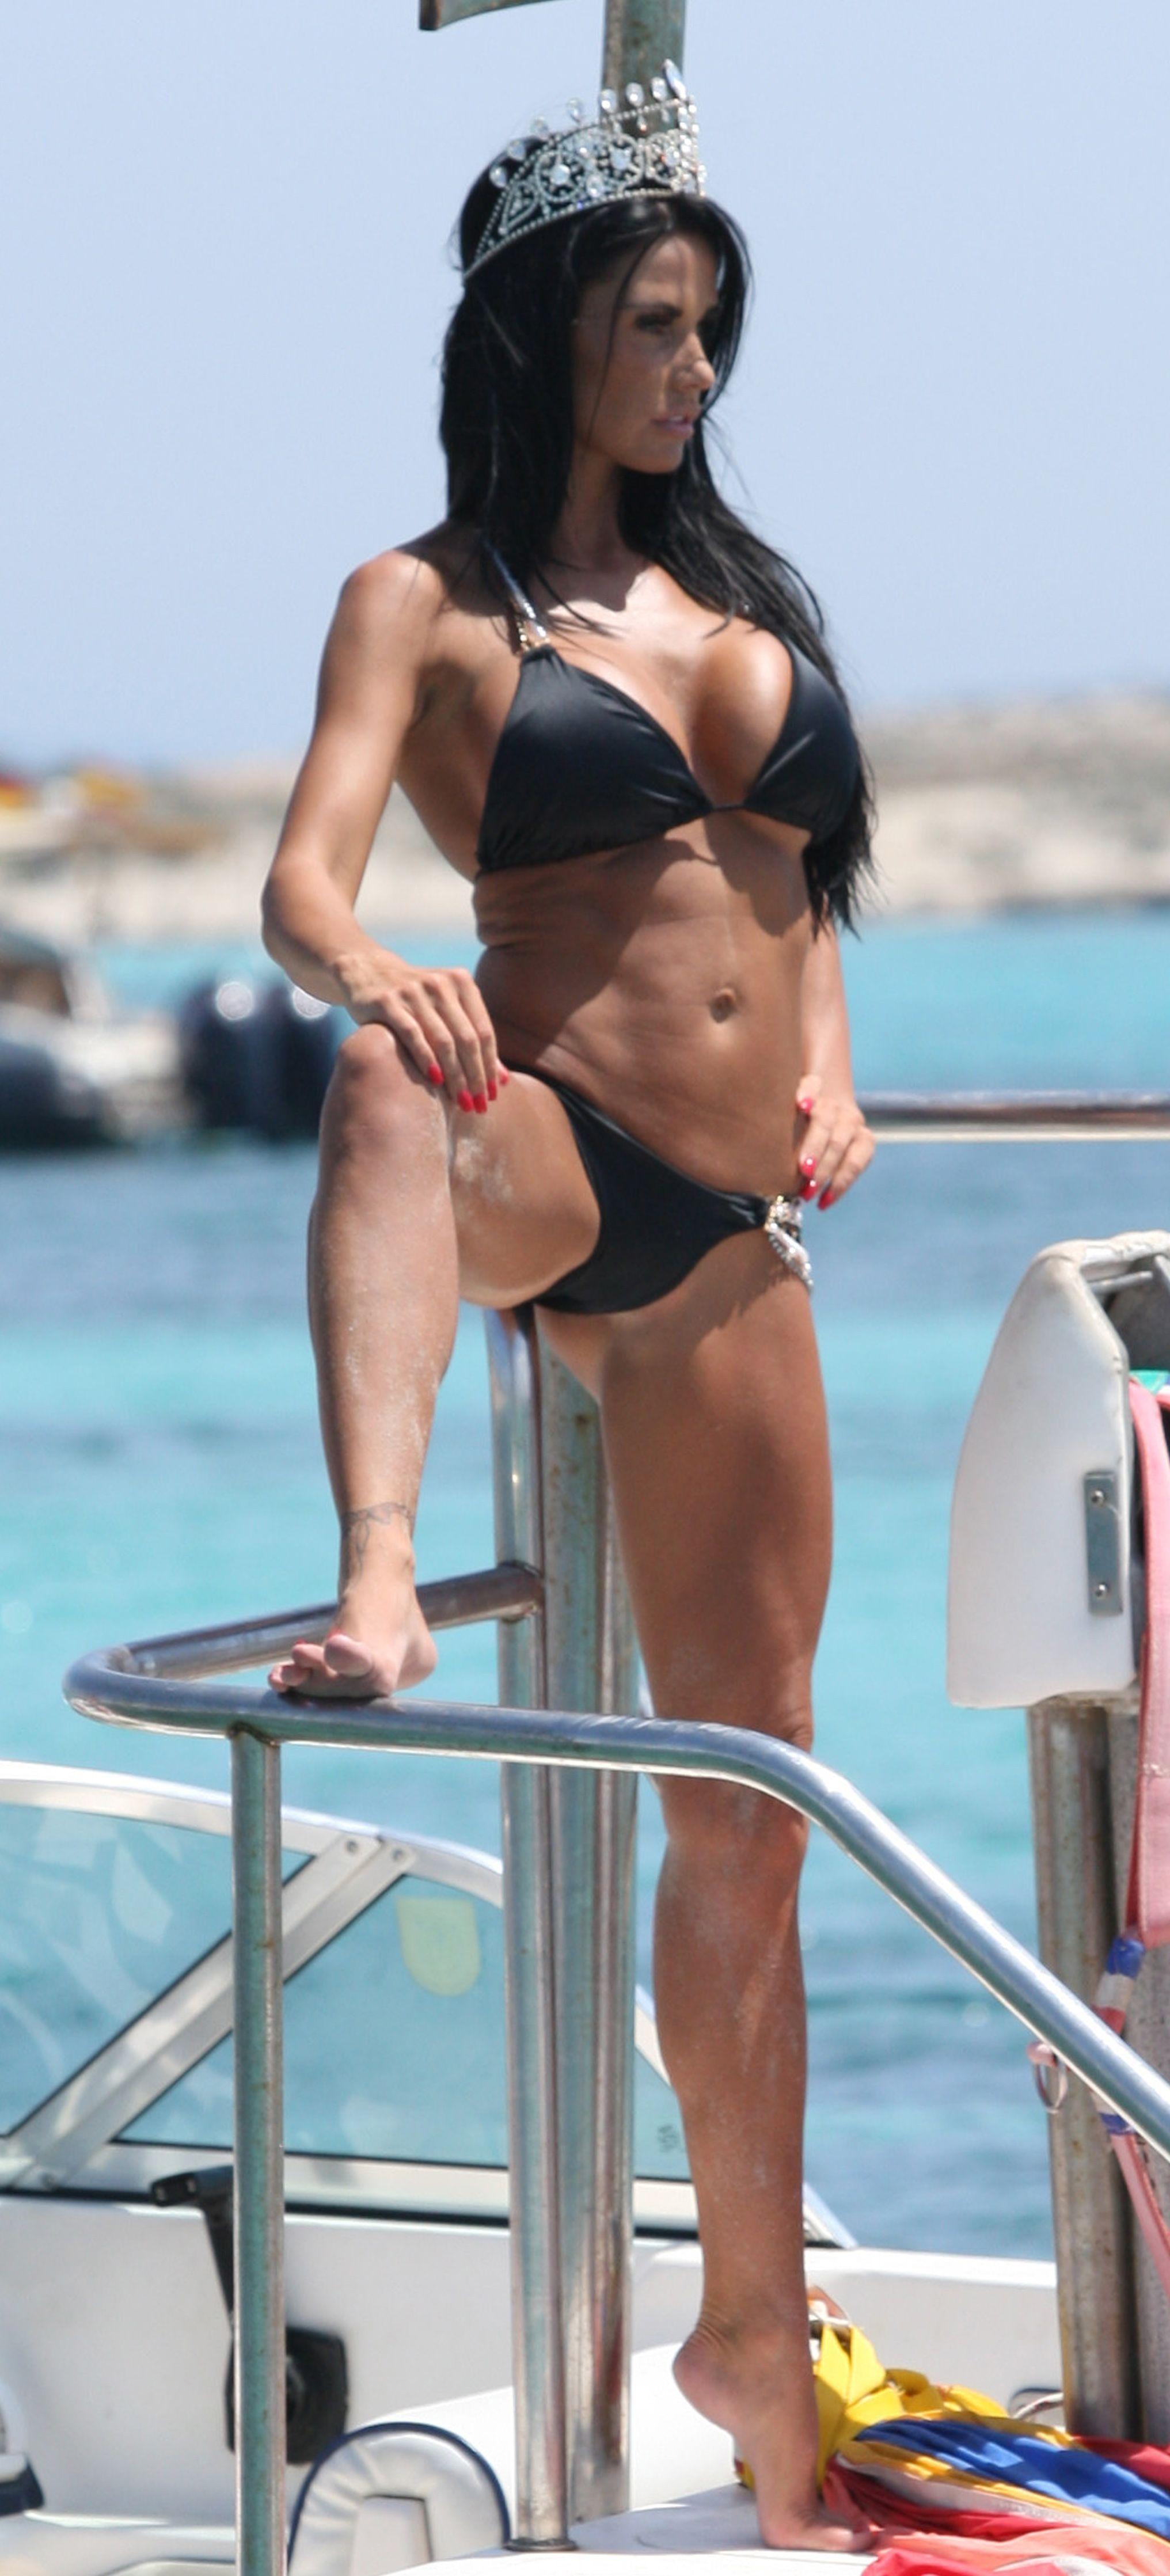 Beamer reccomend Katie price bikini pics